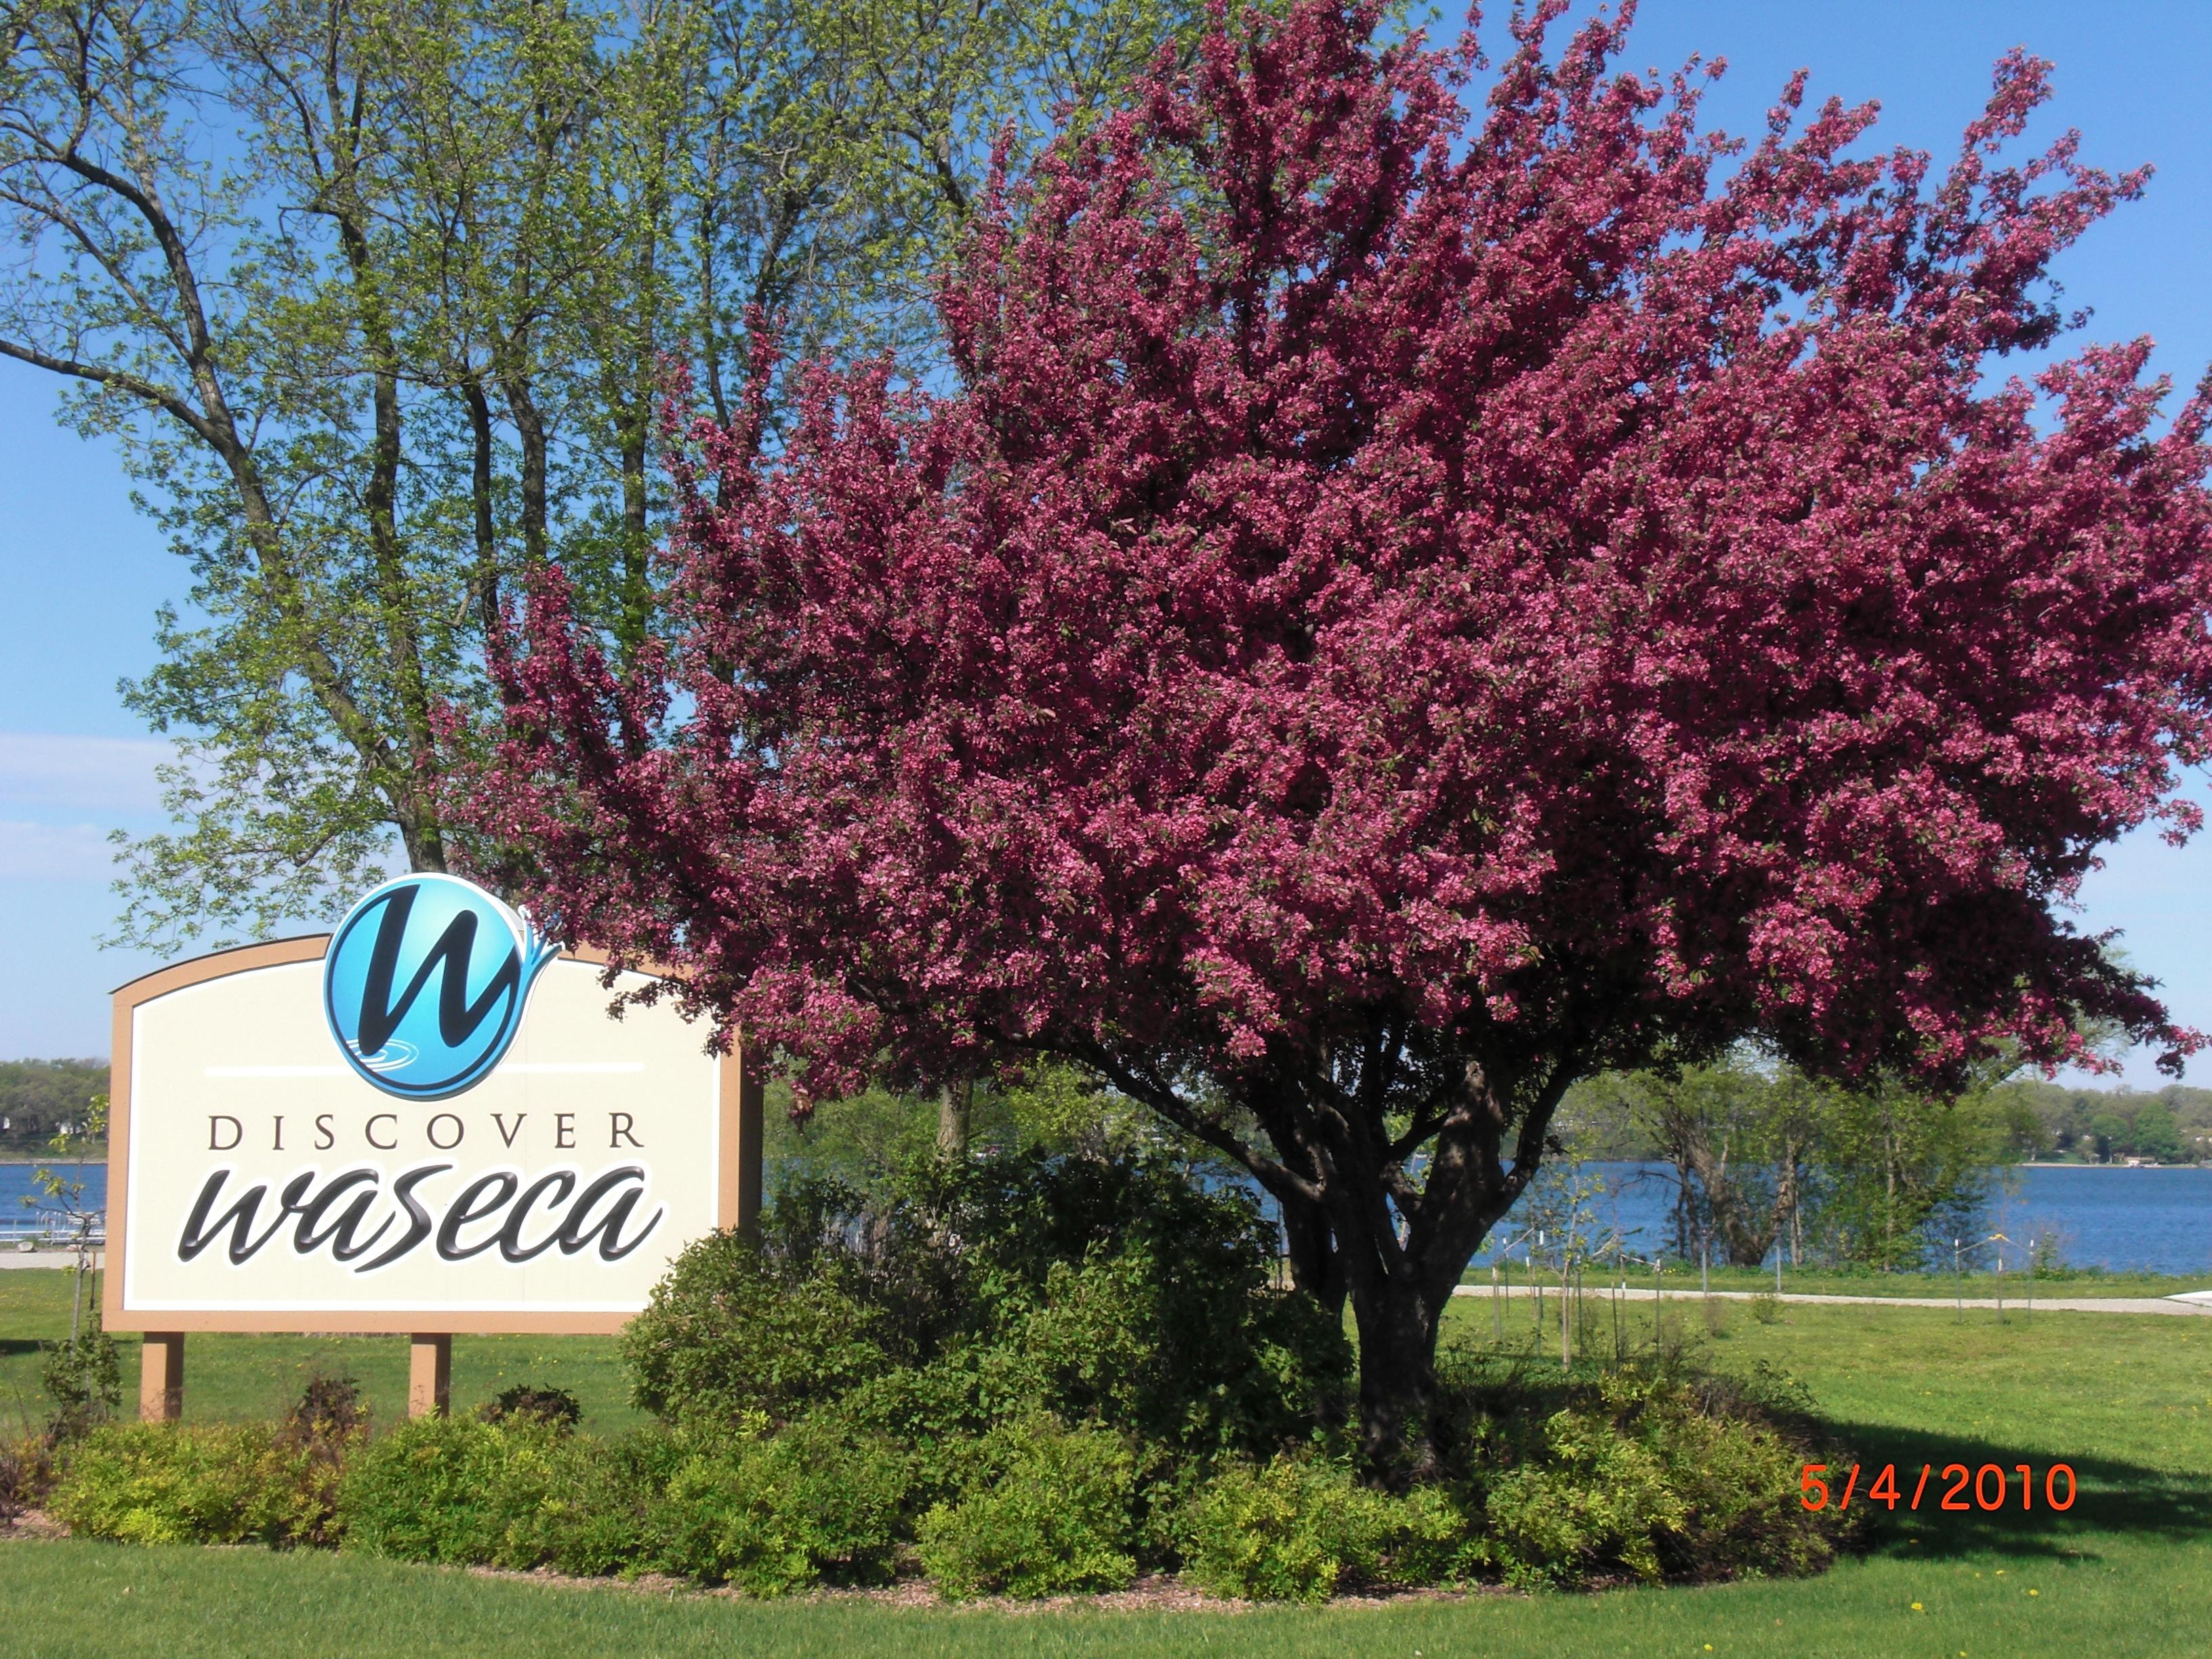 Waseca, start a company